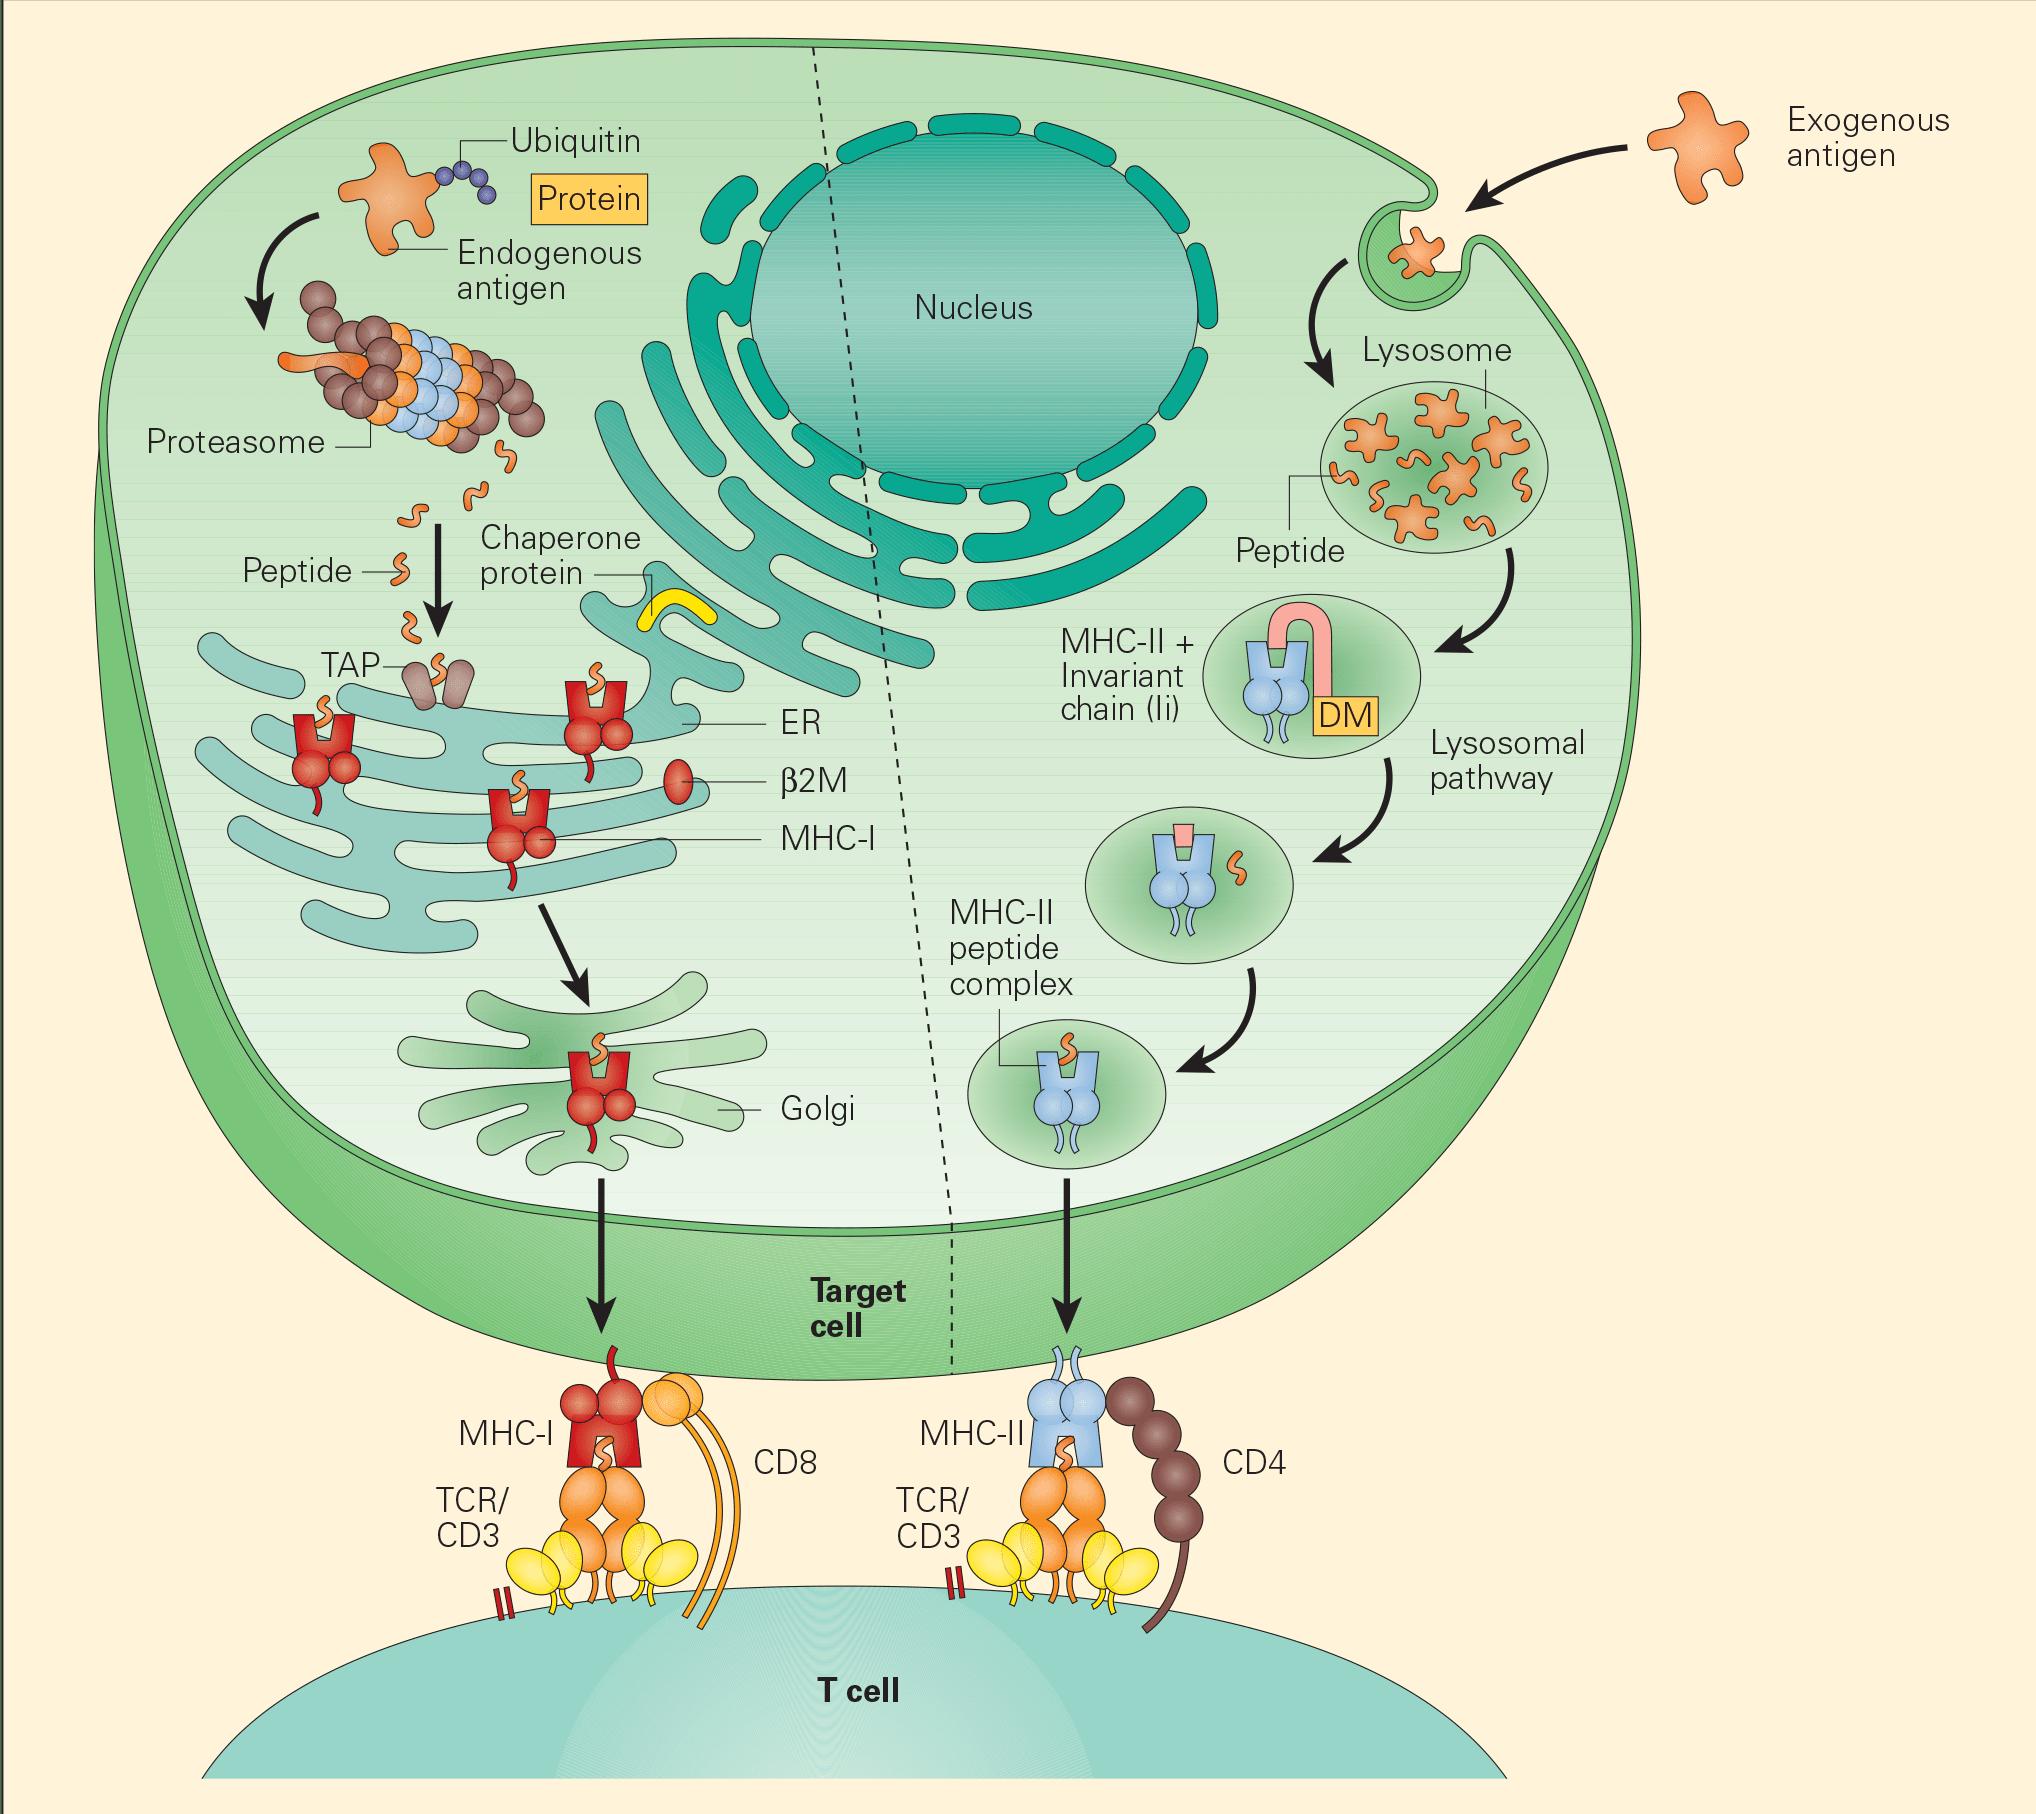 Tumour-associated antigen processing